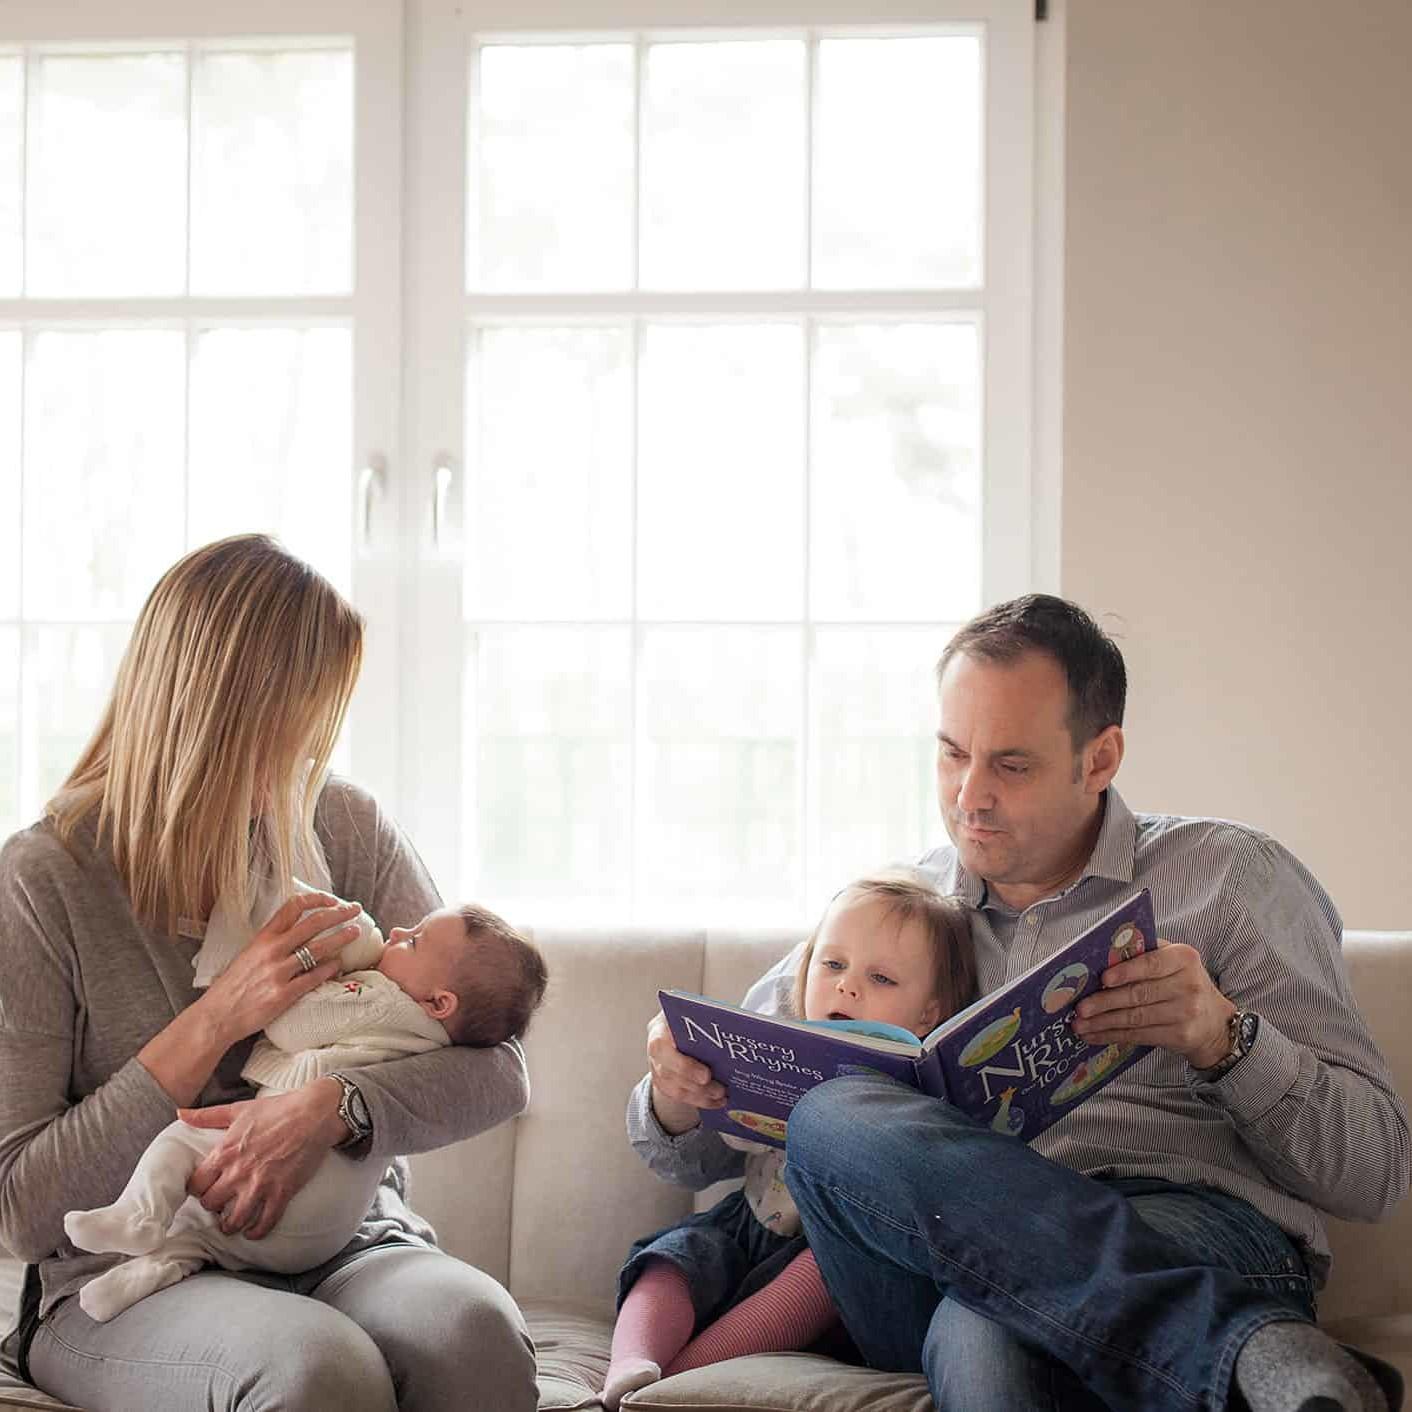 Newborn Photoshoots at home. Edinburgh and surrounding areas. 38